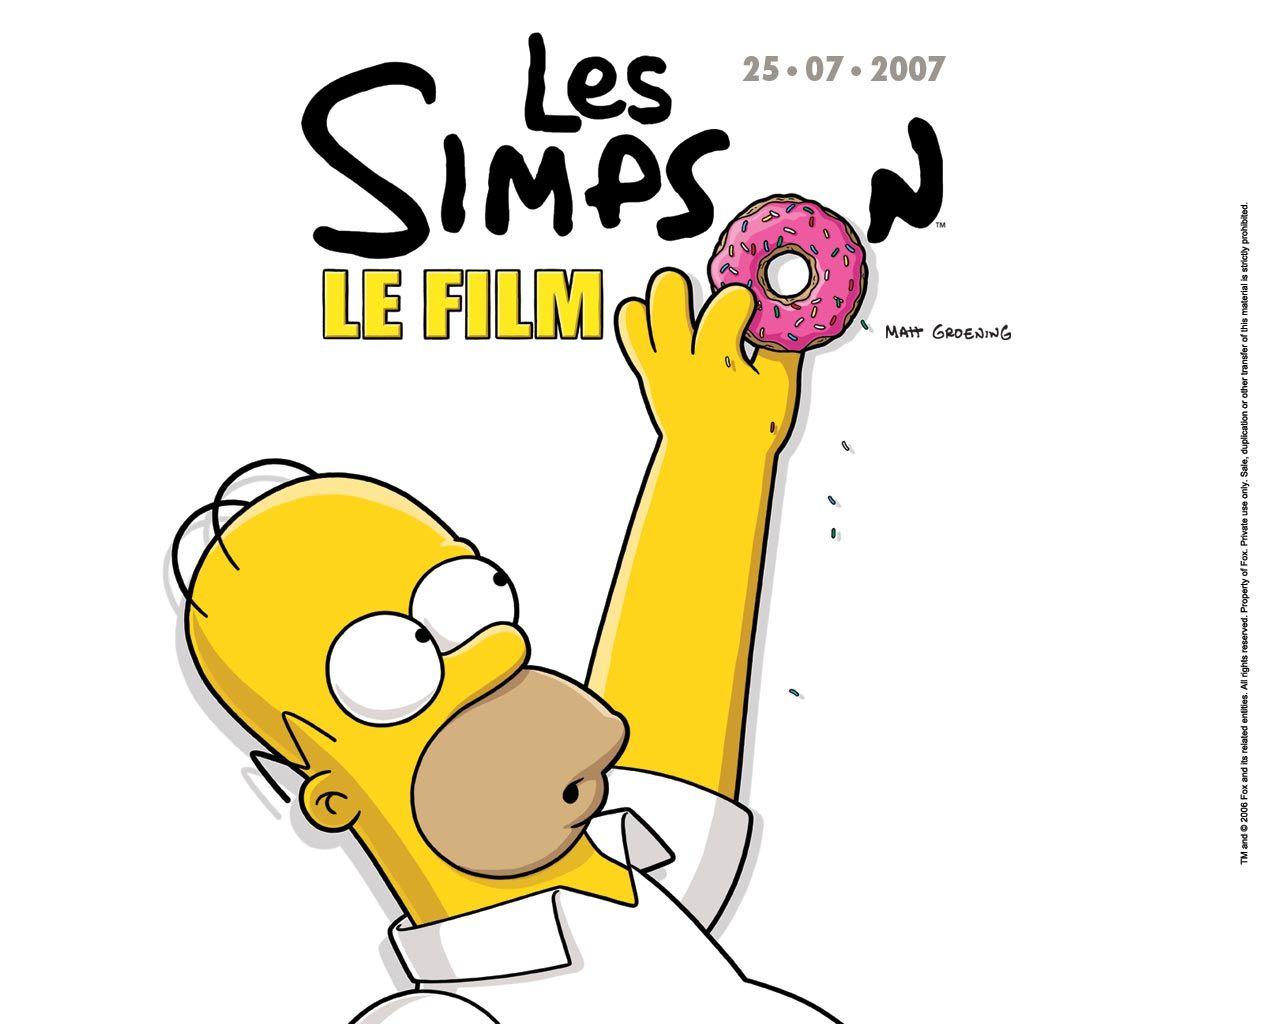 Les+simpson+le+film+en+streaming